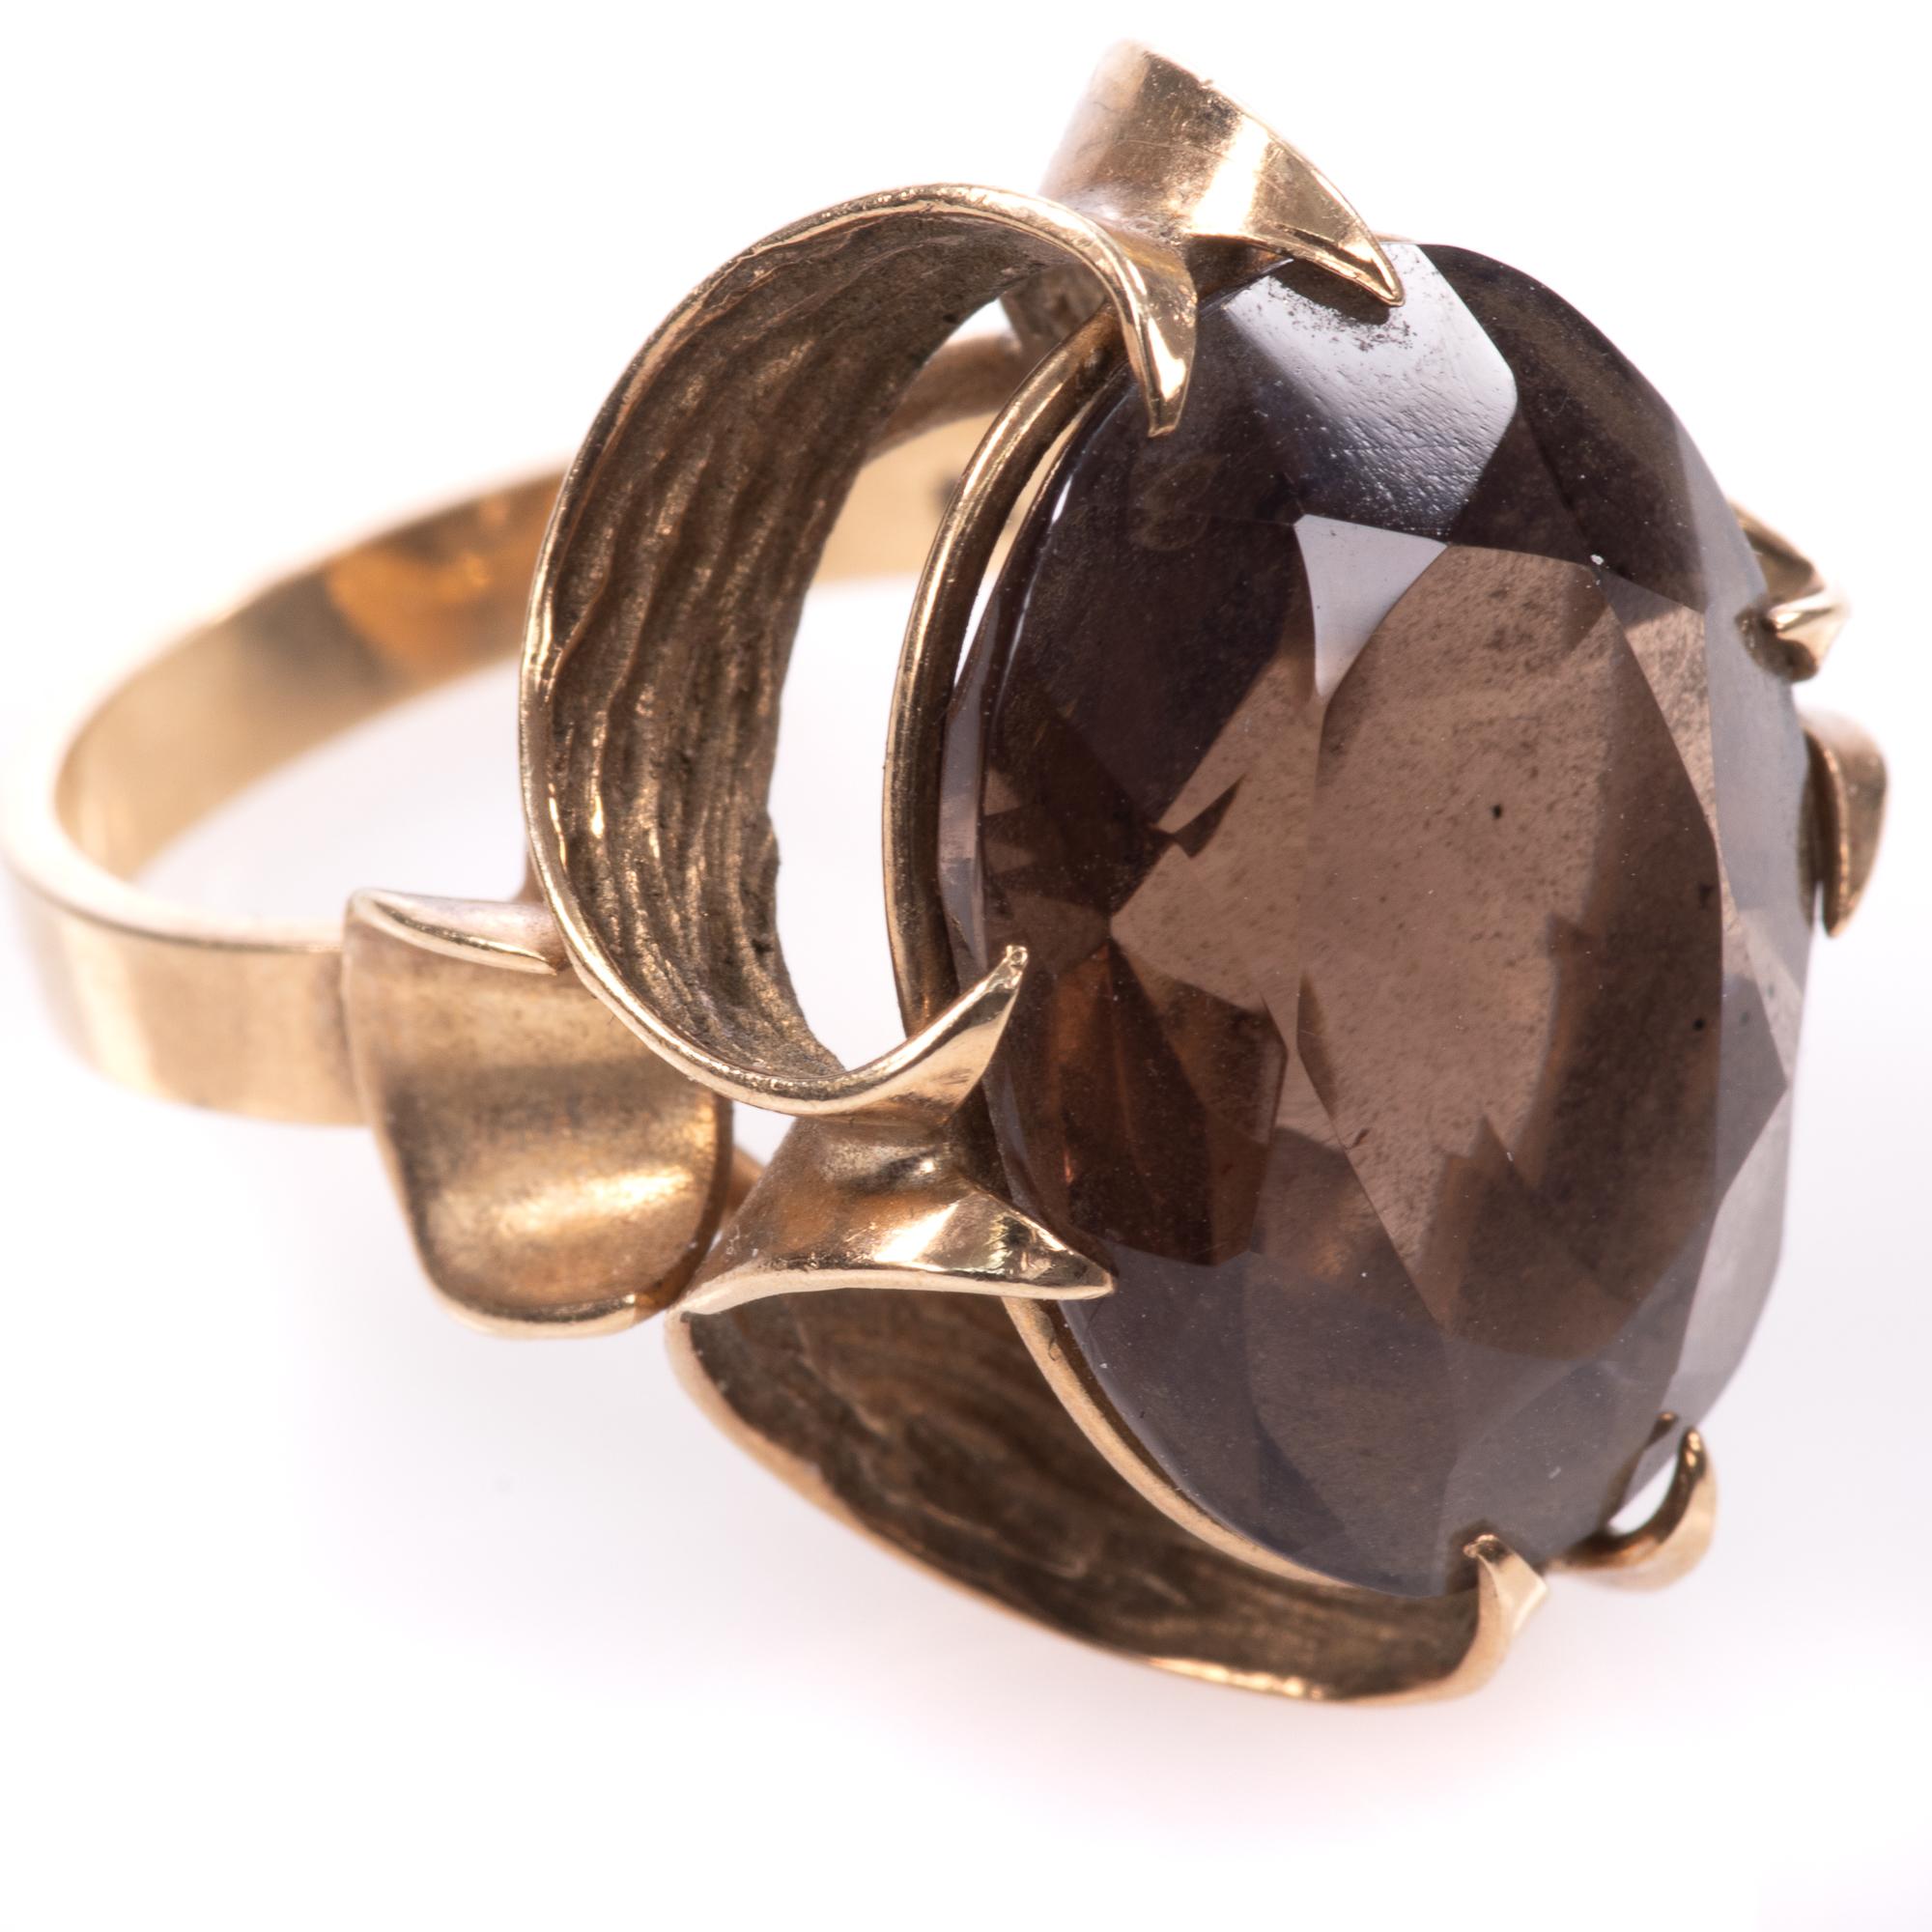 9ct Gold 12.75ct Smoky Quartz Ring - Image 6 of 7